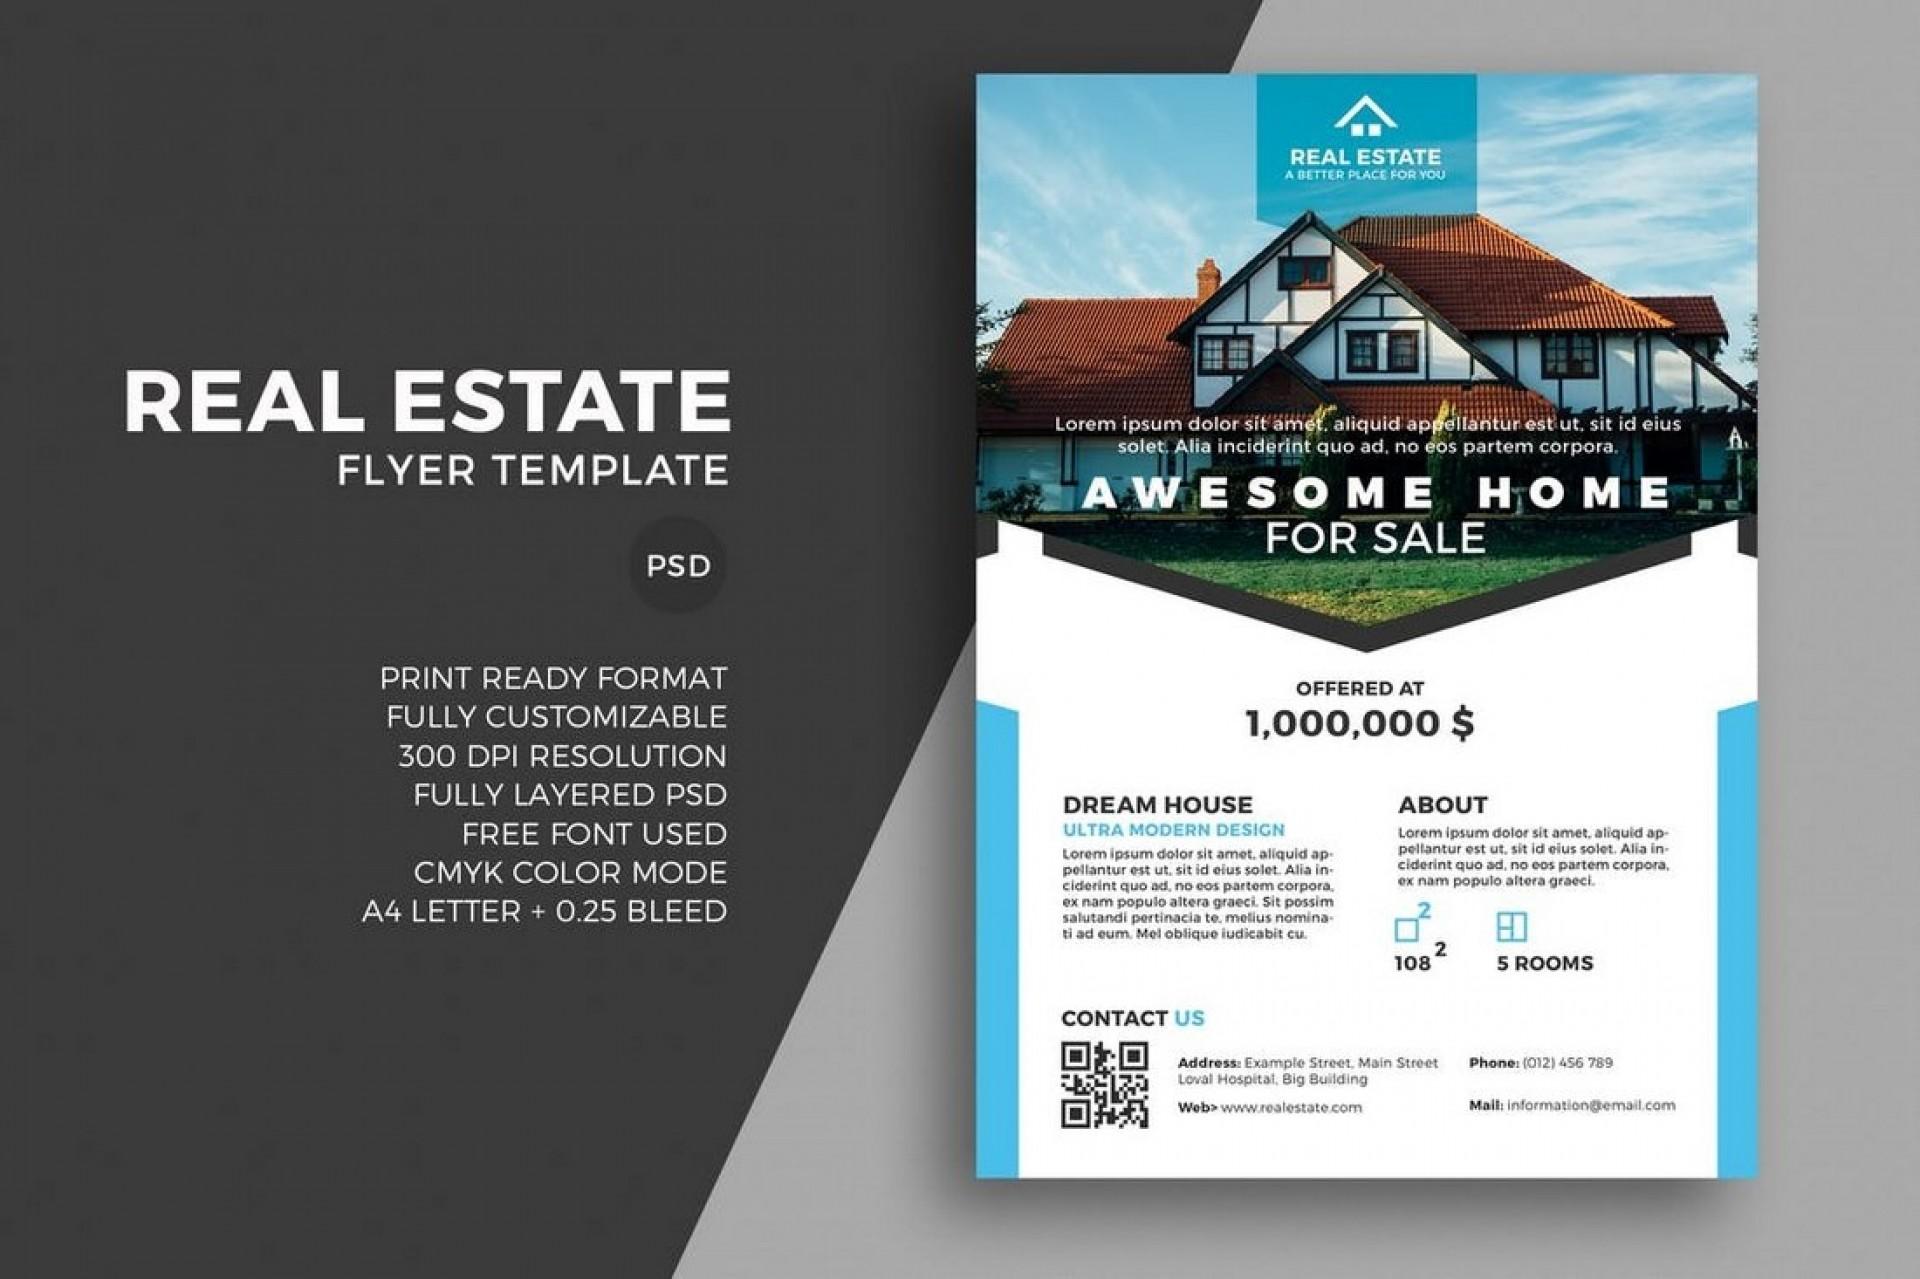 008 Breathtaking Real Estate Marketing Flyer Template Free Image 1920